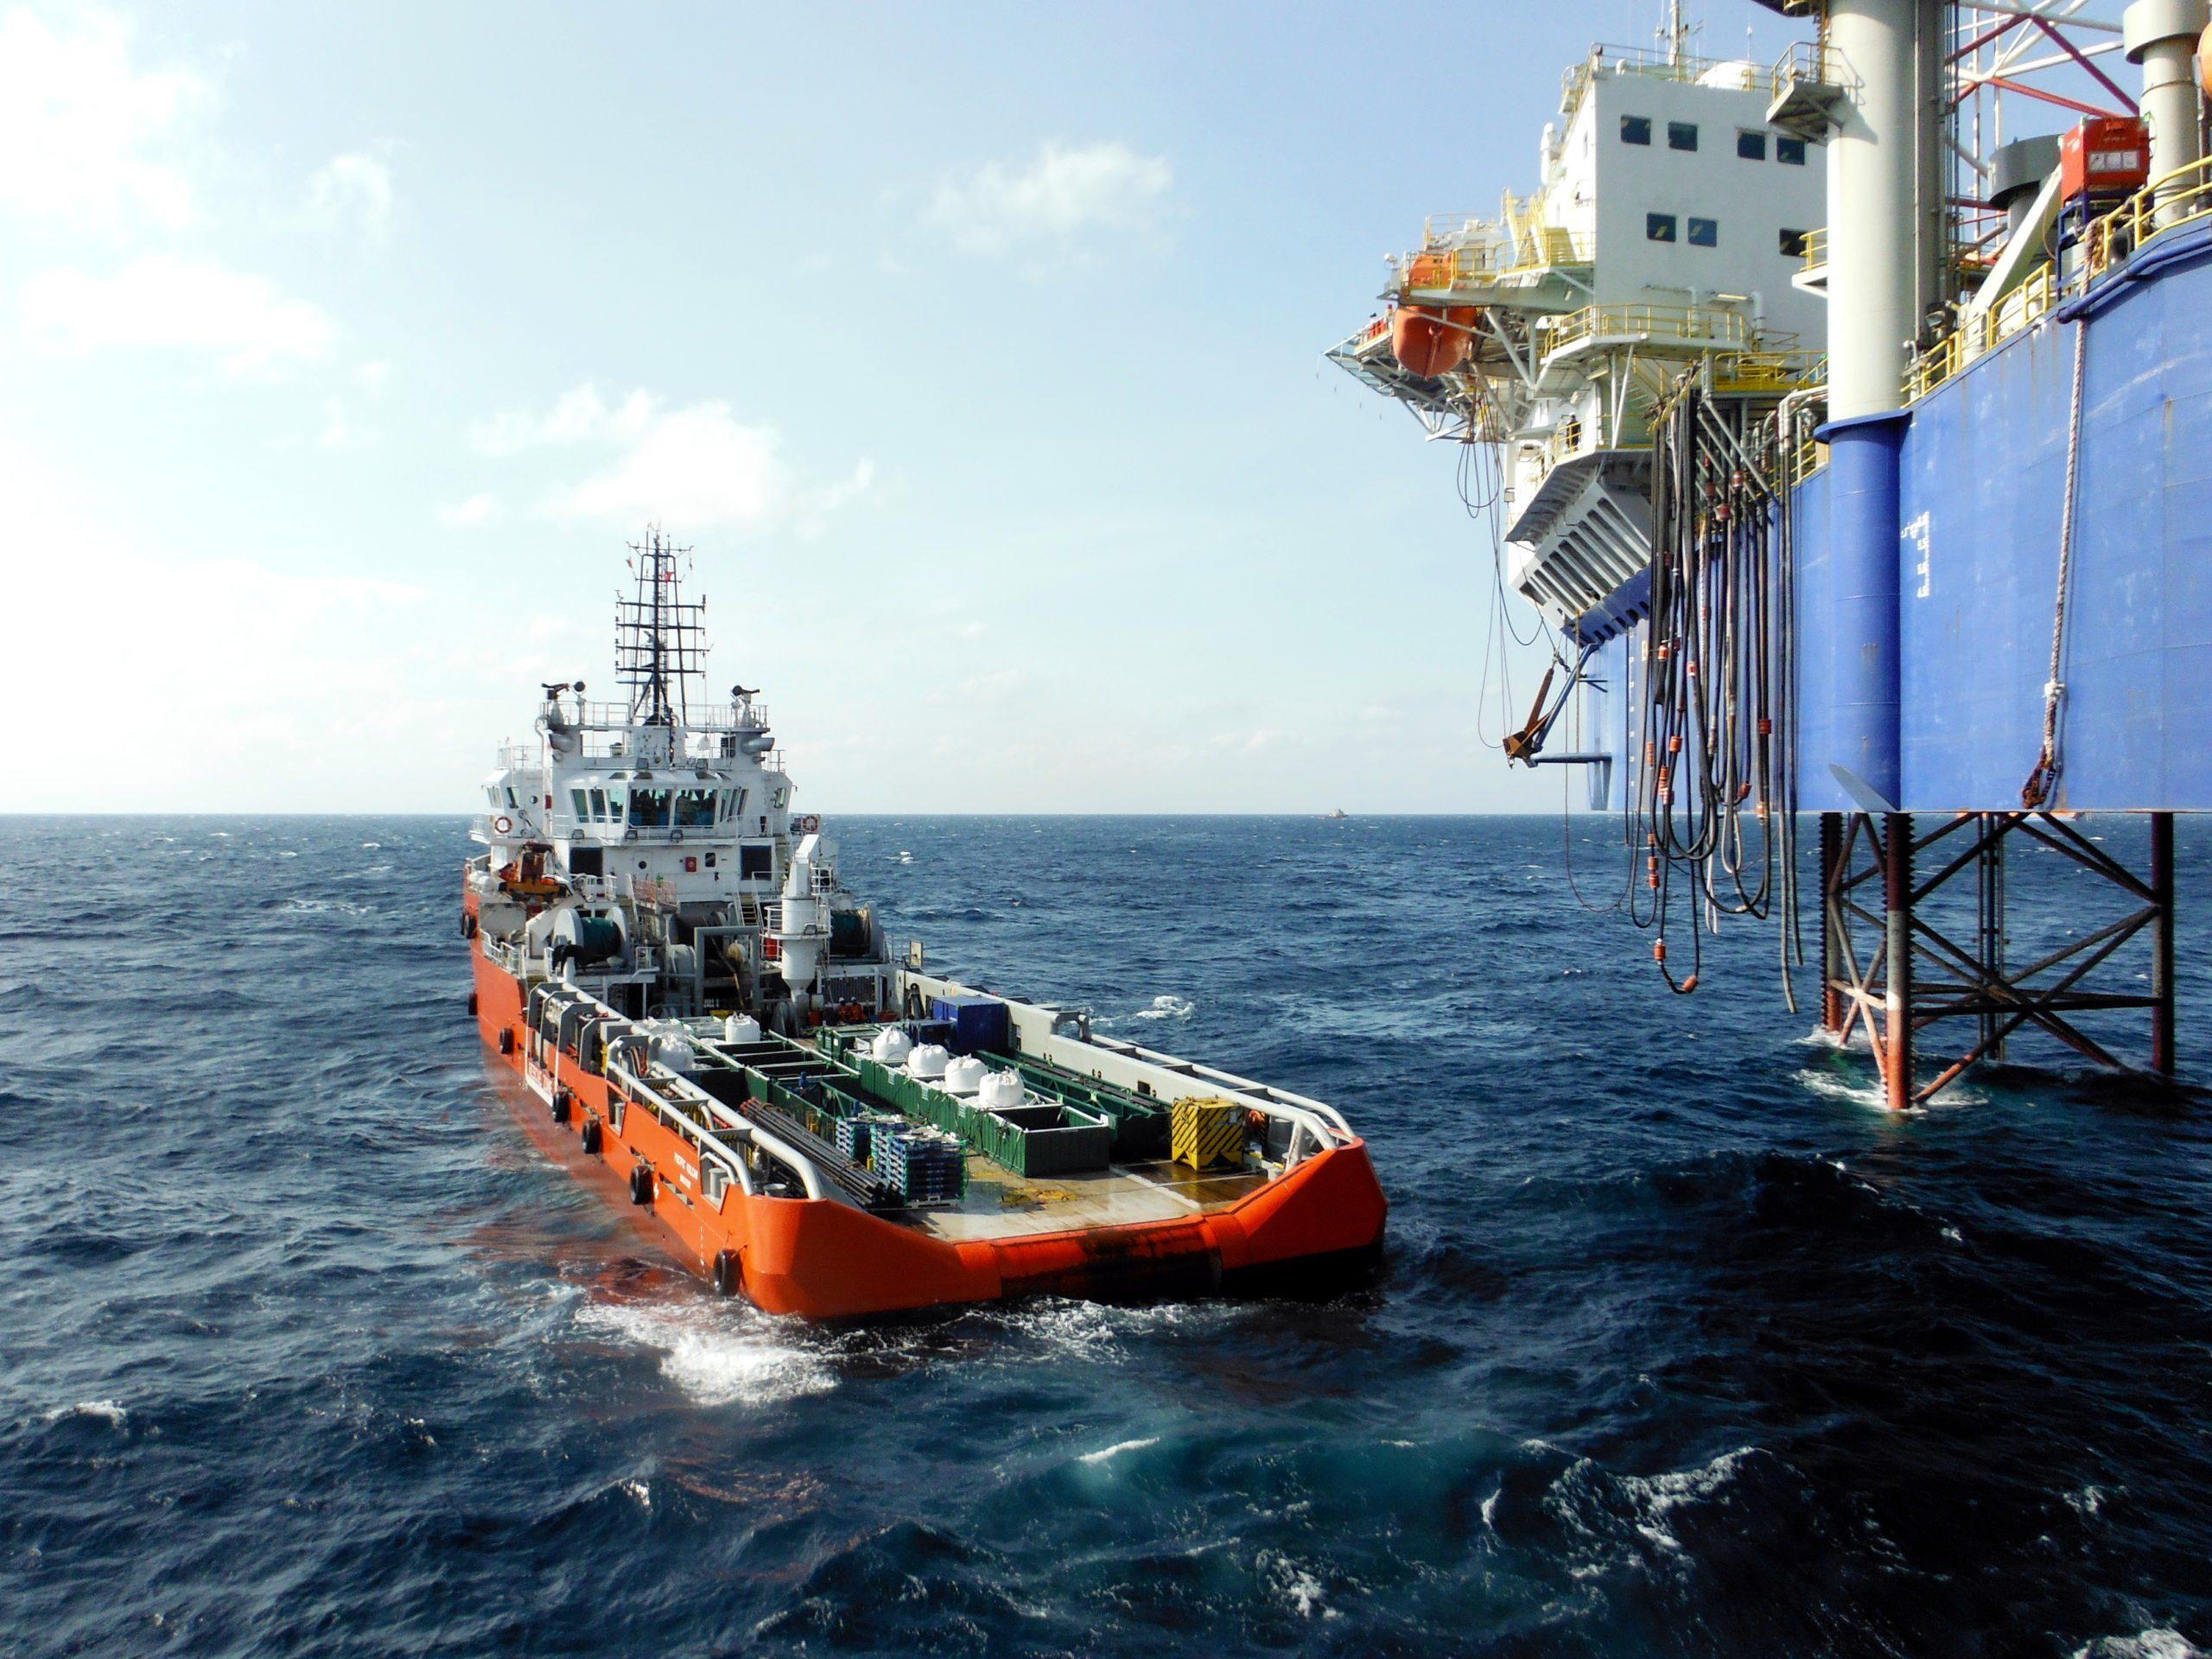 Nautical Control Solutions, LP (FUELTRAX) partners with Dataran Elektra S dn. Bhd. (Dataran Elektra) in Malaysia